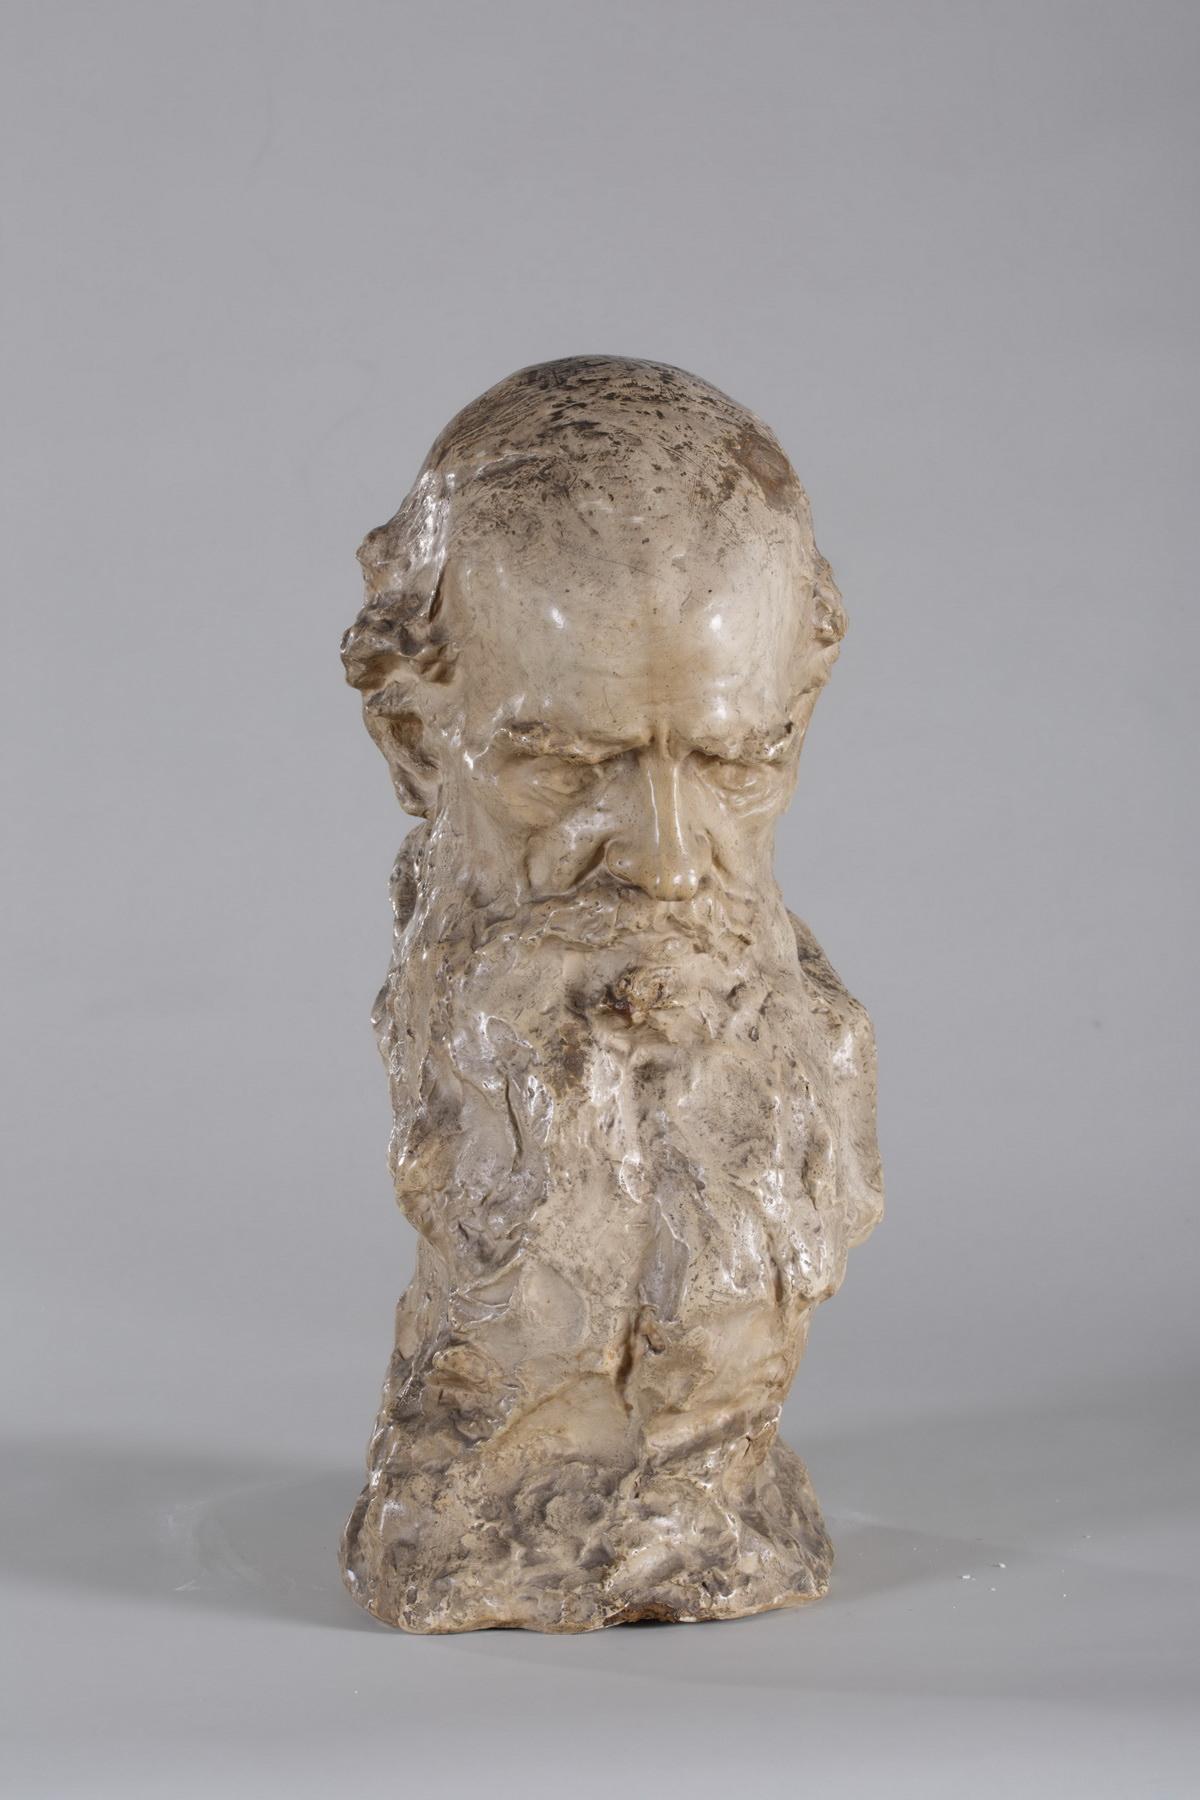 Аронсон Н.Л. Скульптура. Л.Н. Толстой. Голова. 1901